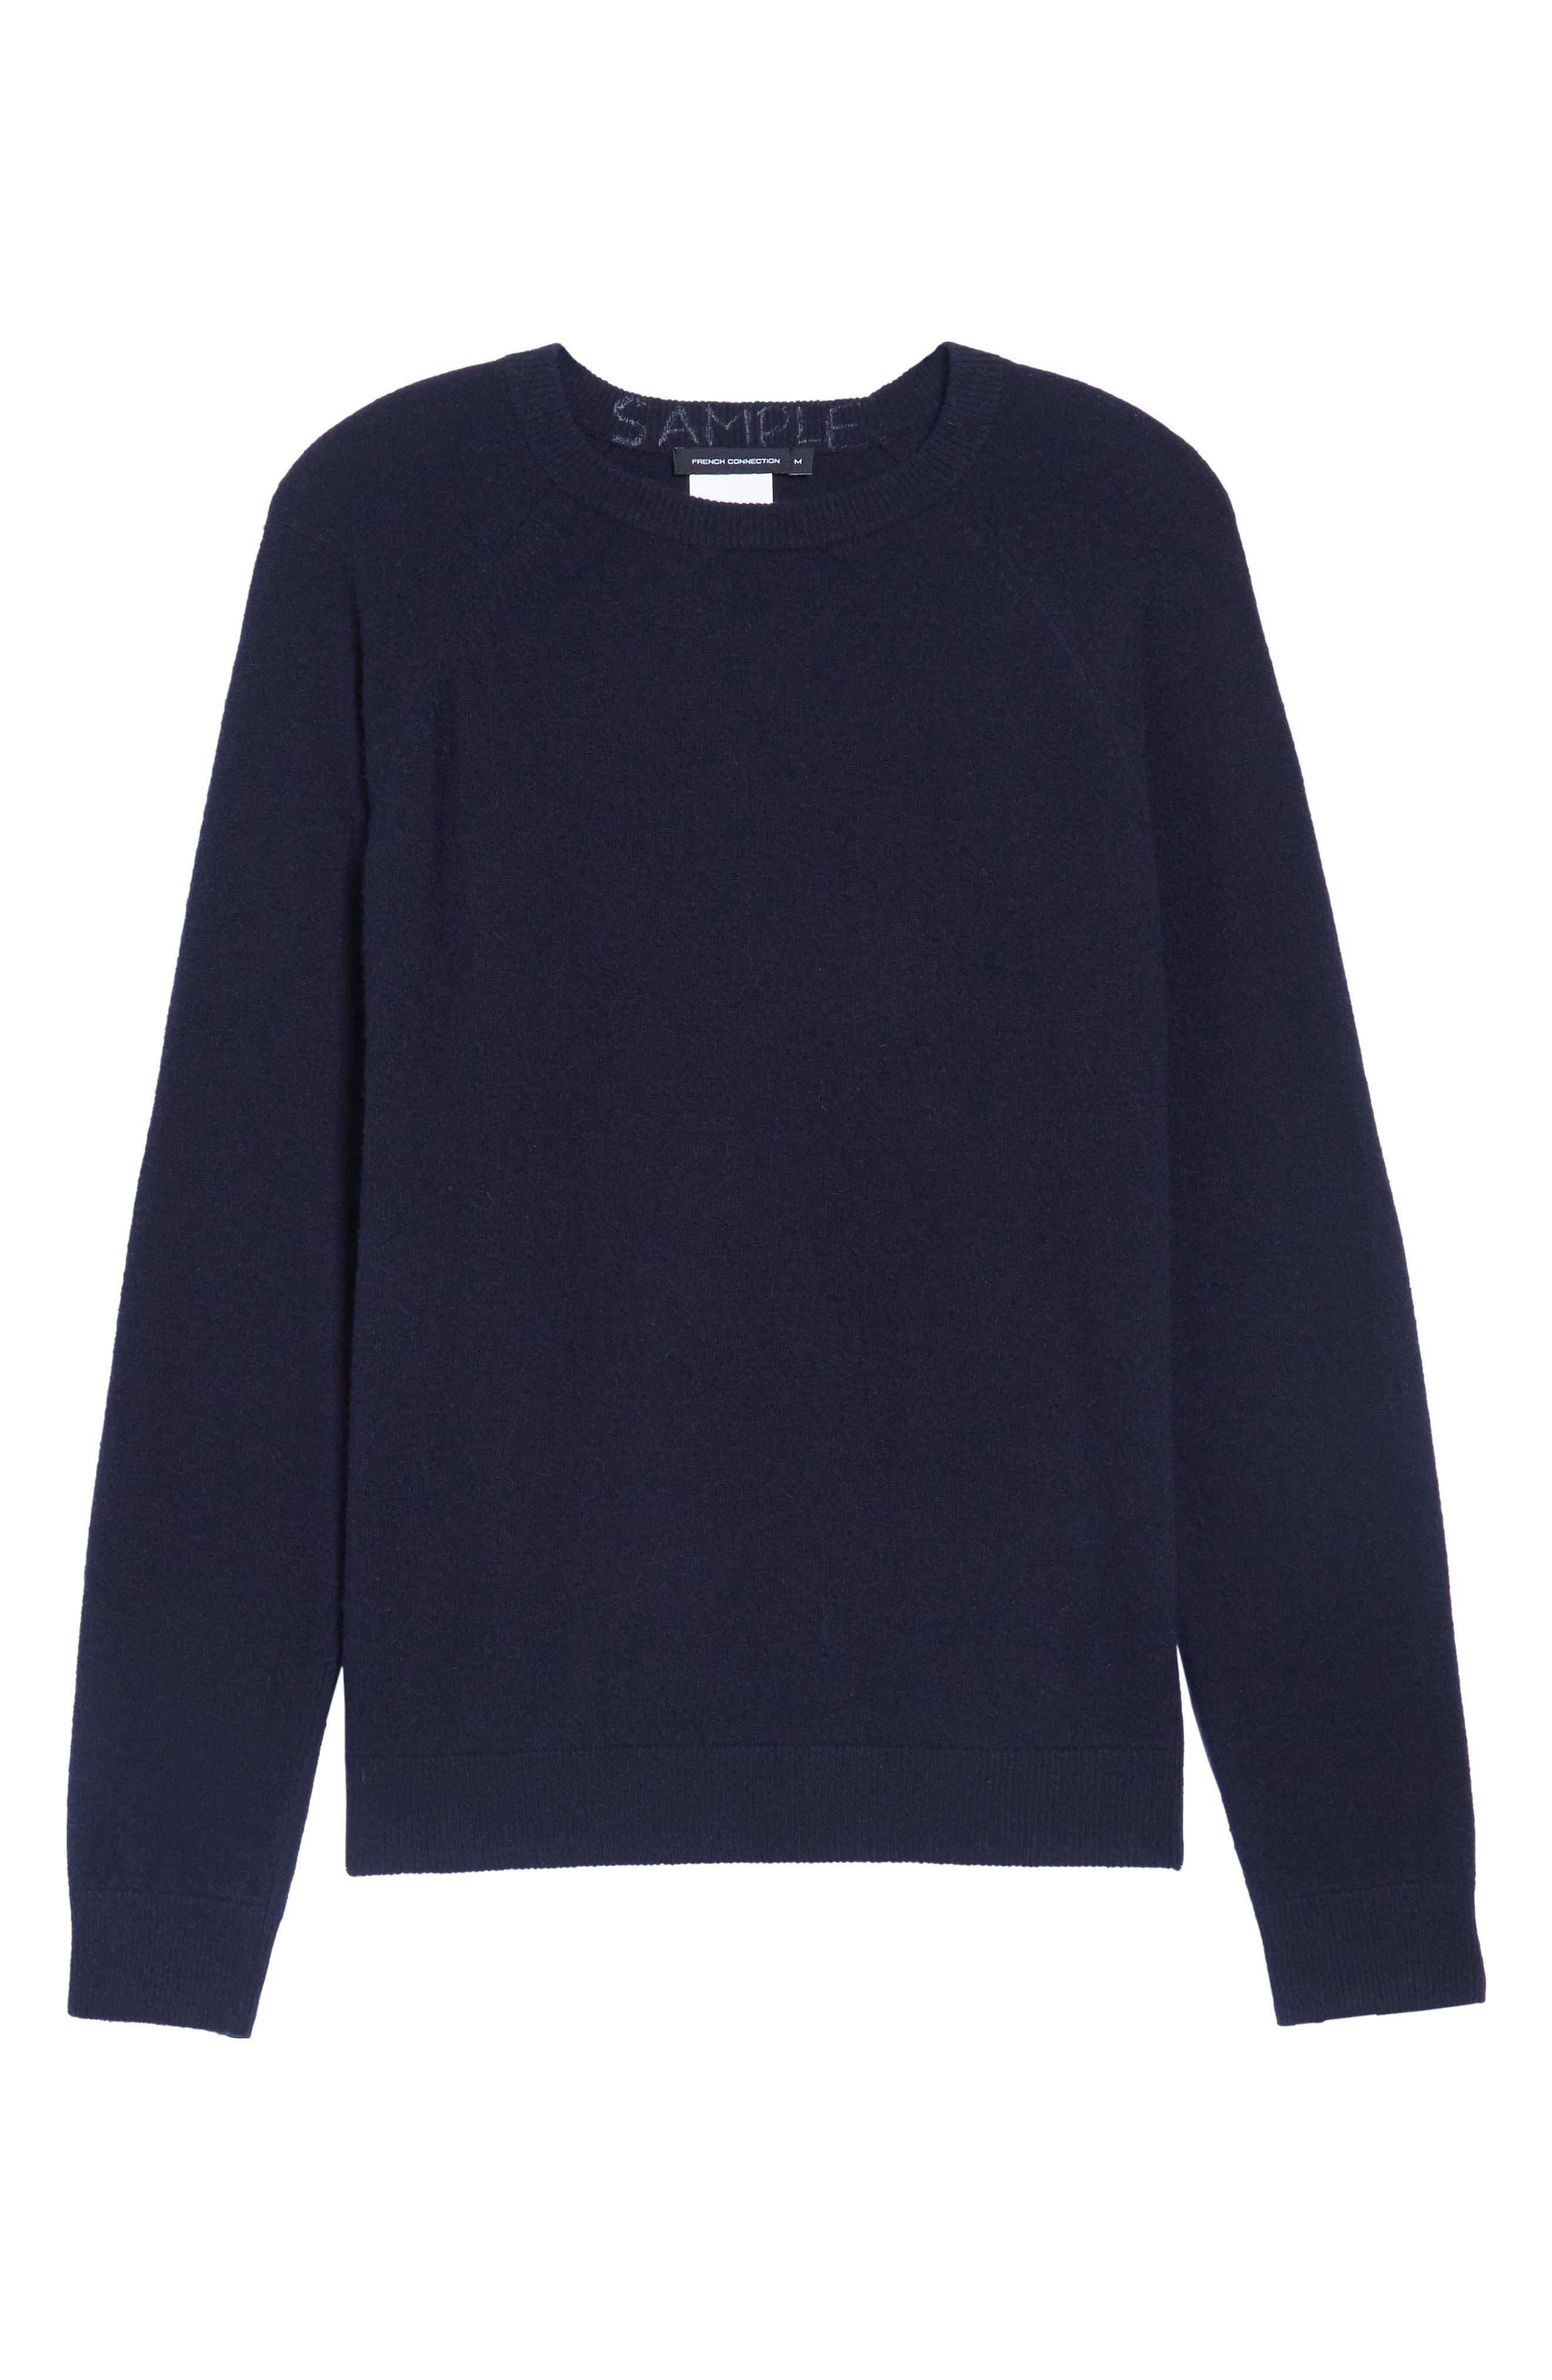 Crewneck Wool Sweater,                             Alternate thumbnail 6, color,                             429